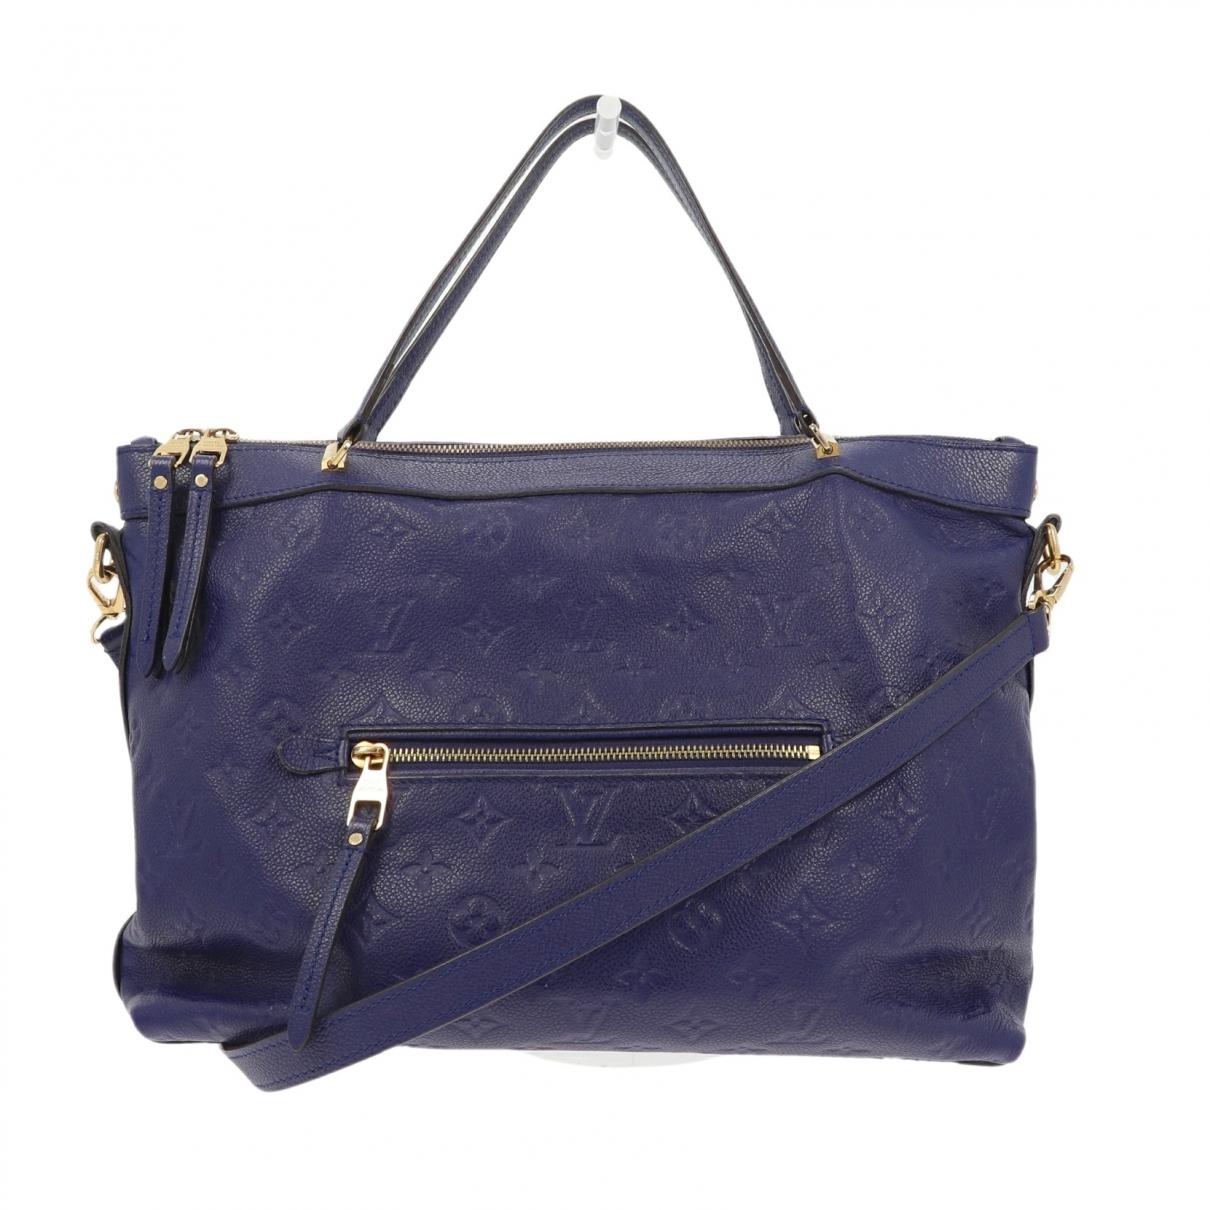 Louis Vuitton Bastille Blue Leather handbag for Women N